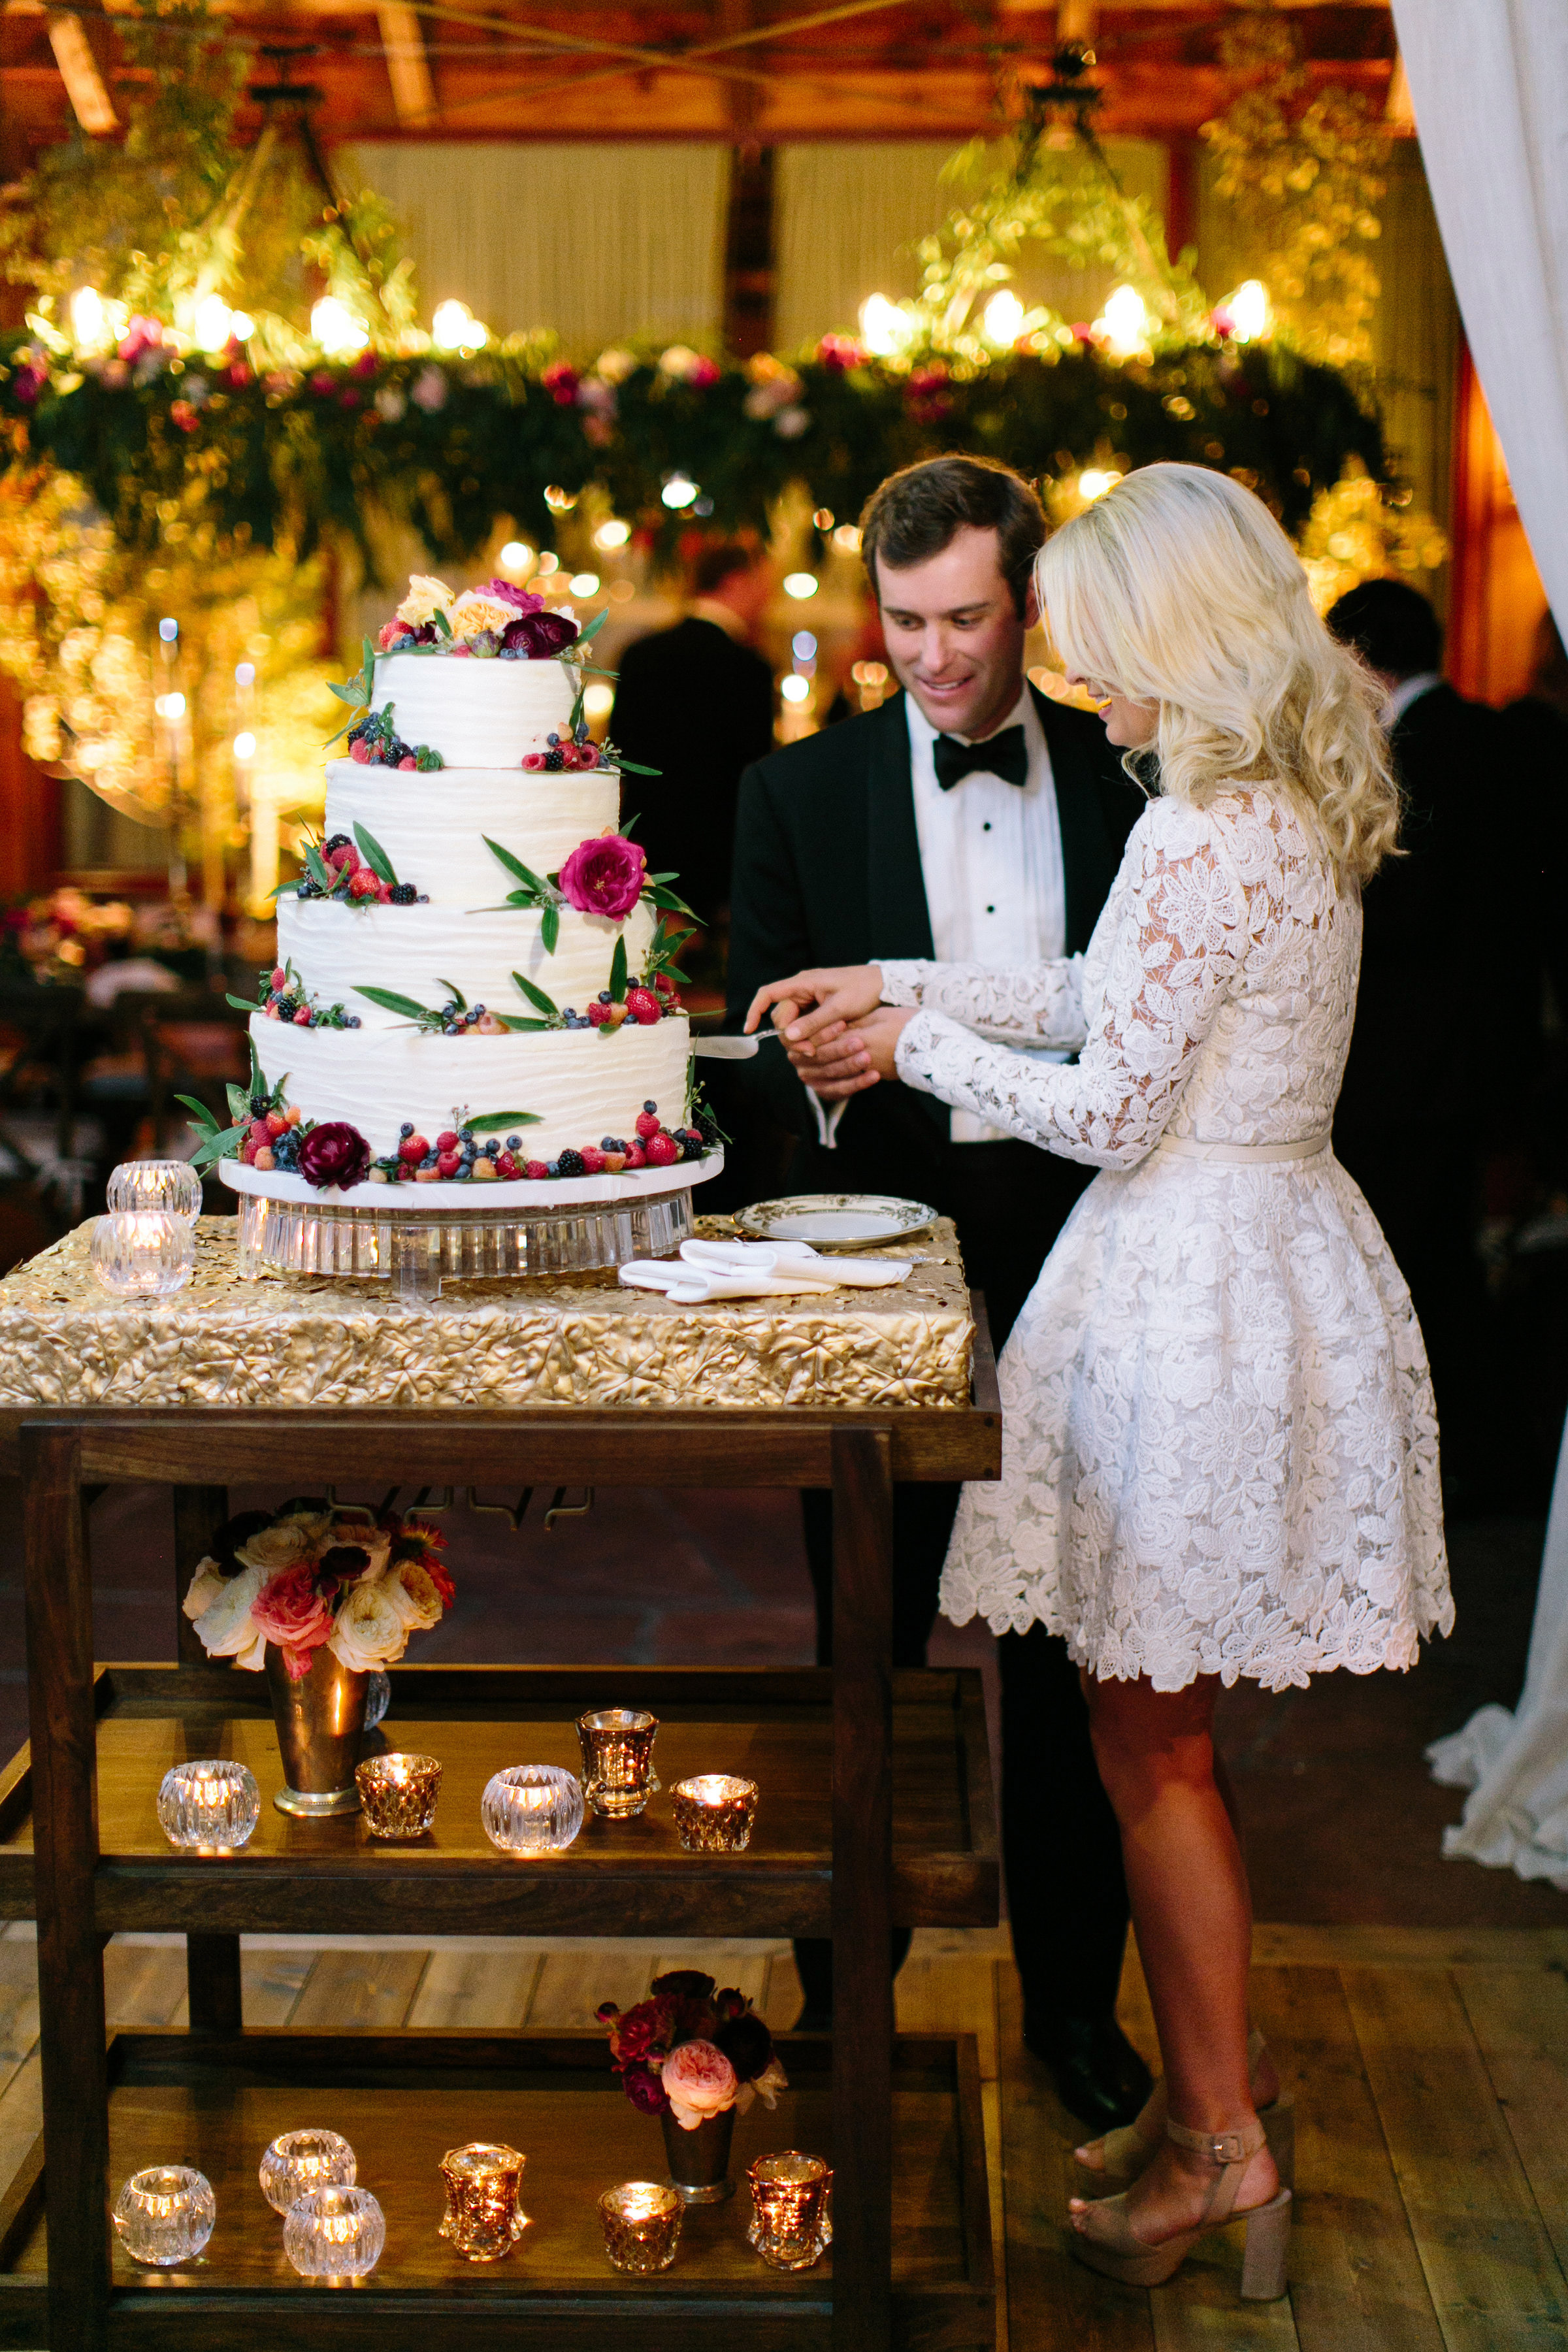 bride groom cake cutting